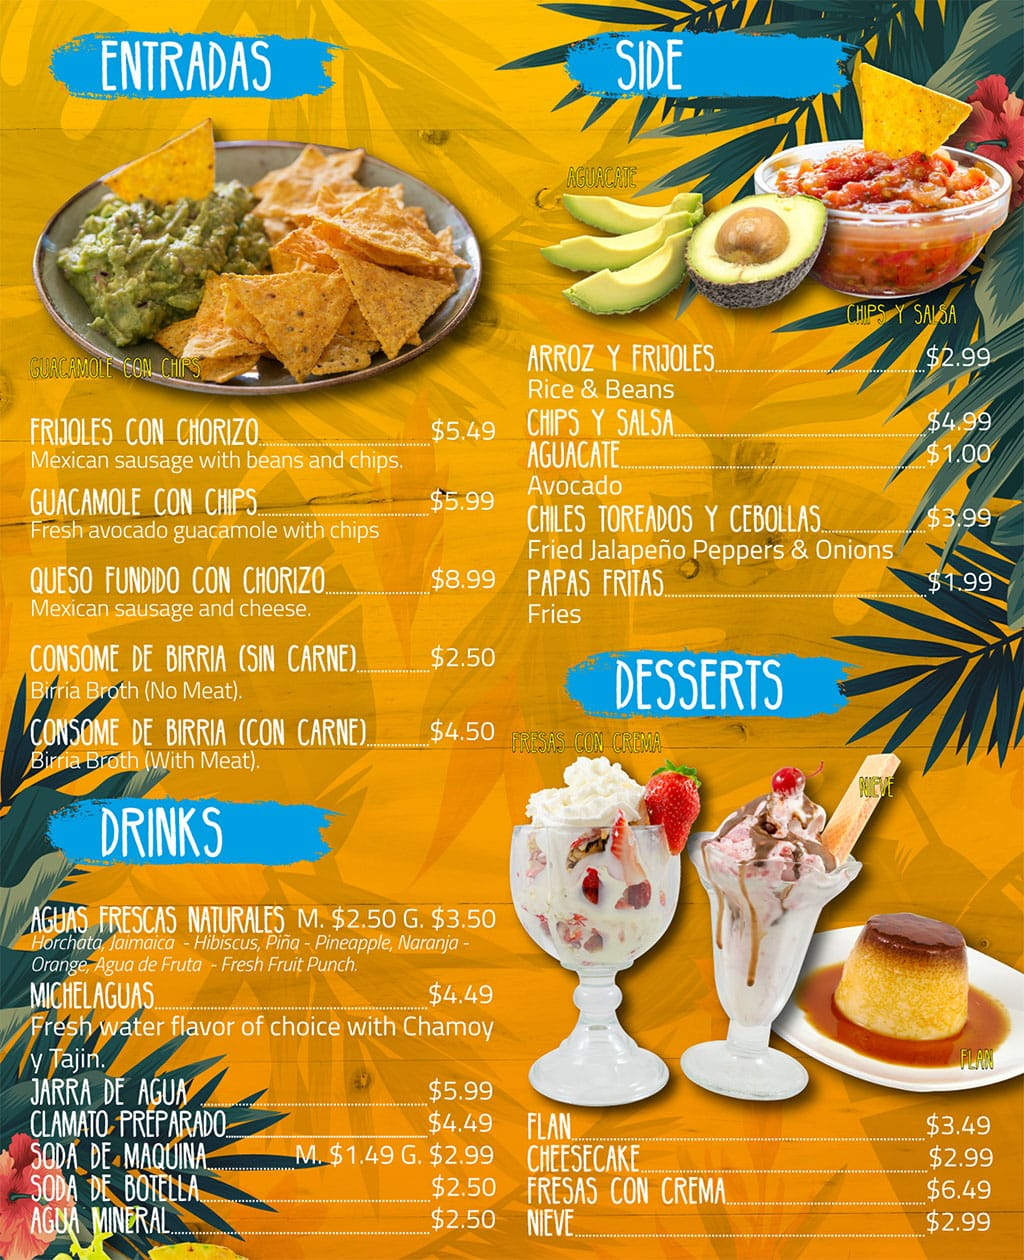 Puerto Vallarta Mexican Grill menu - entradas, sides, drinks, desserts